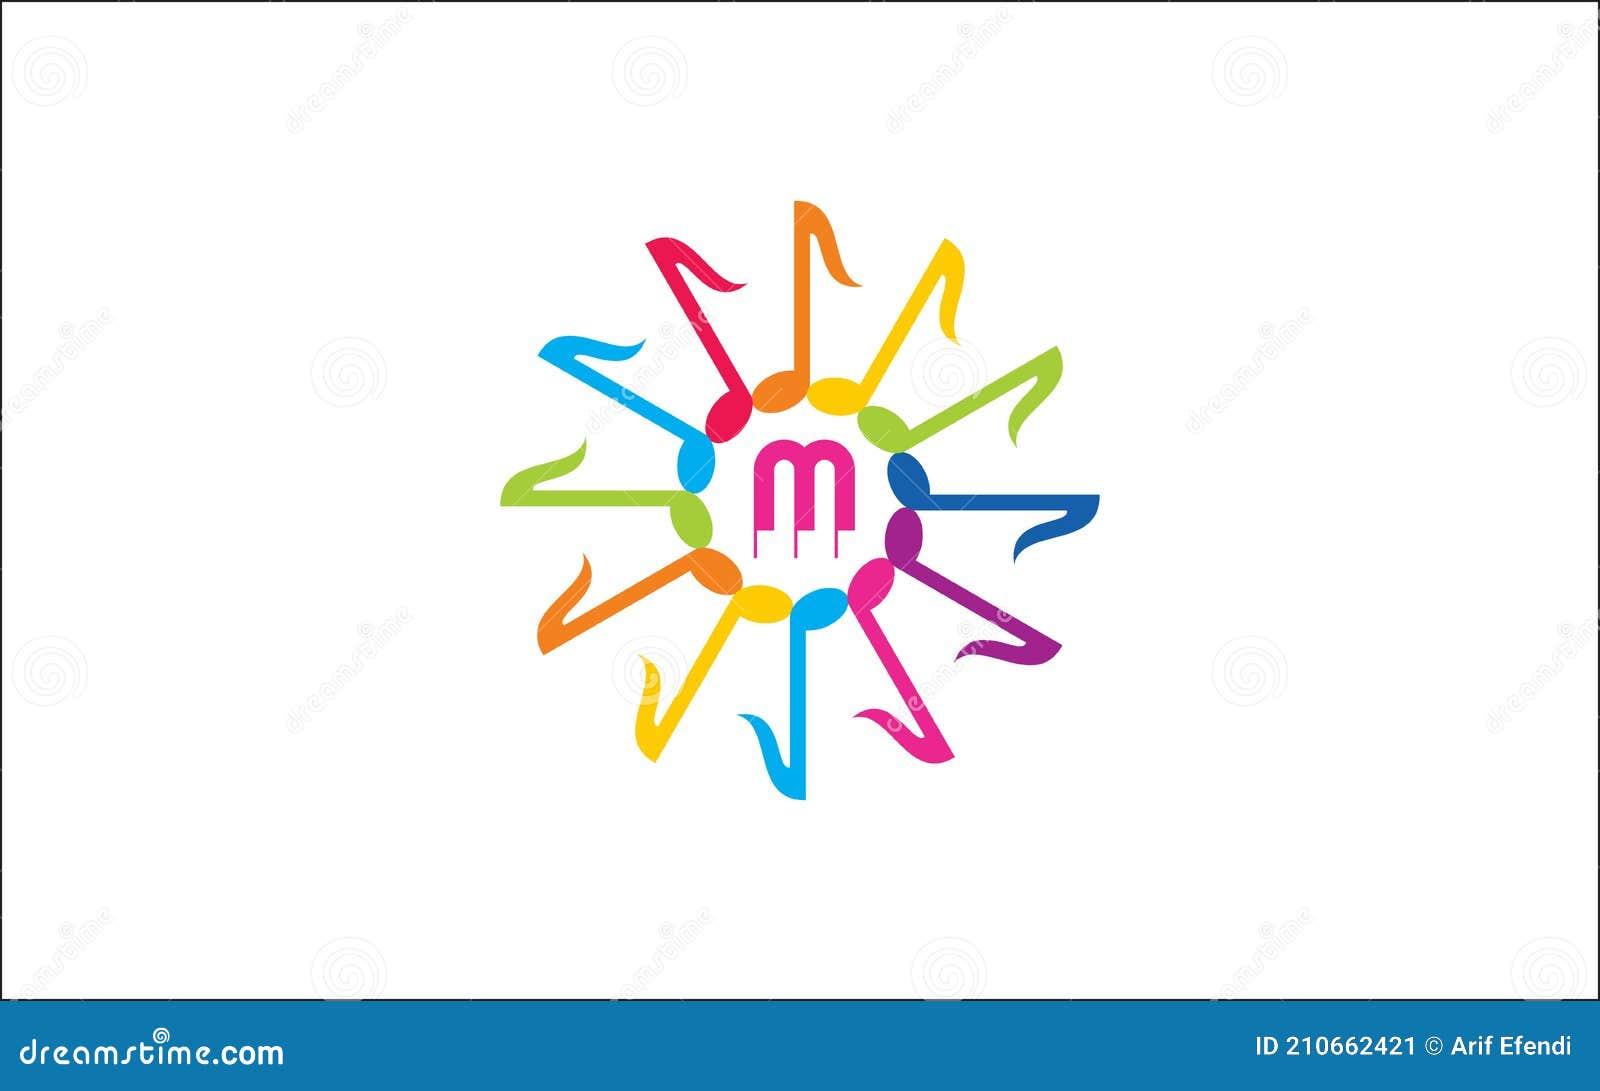 Music School Logo Stock Illustrations 4 813 Music School Logo Stock Illustrations Vectors Clipart Dreamstime